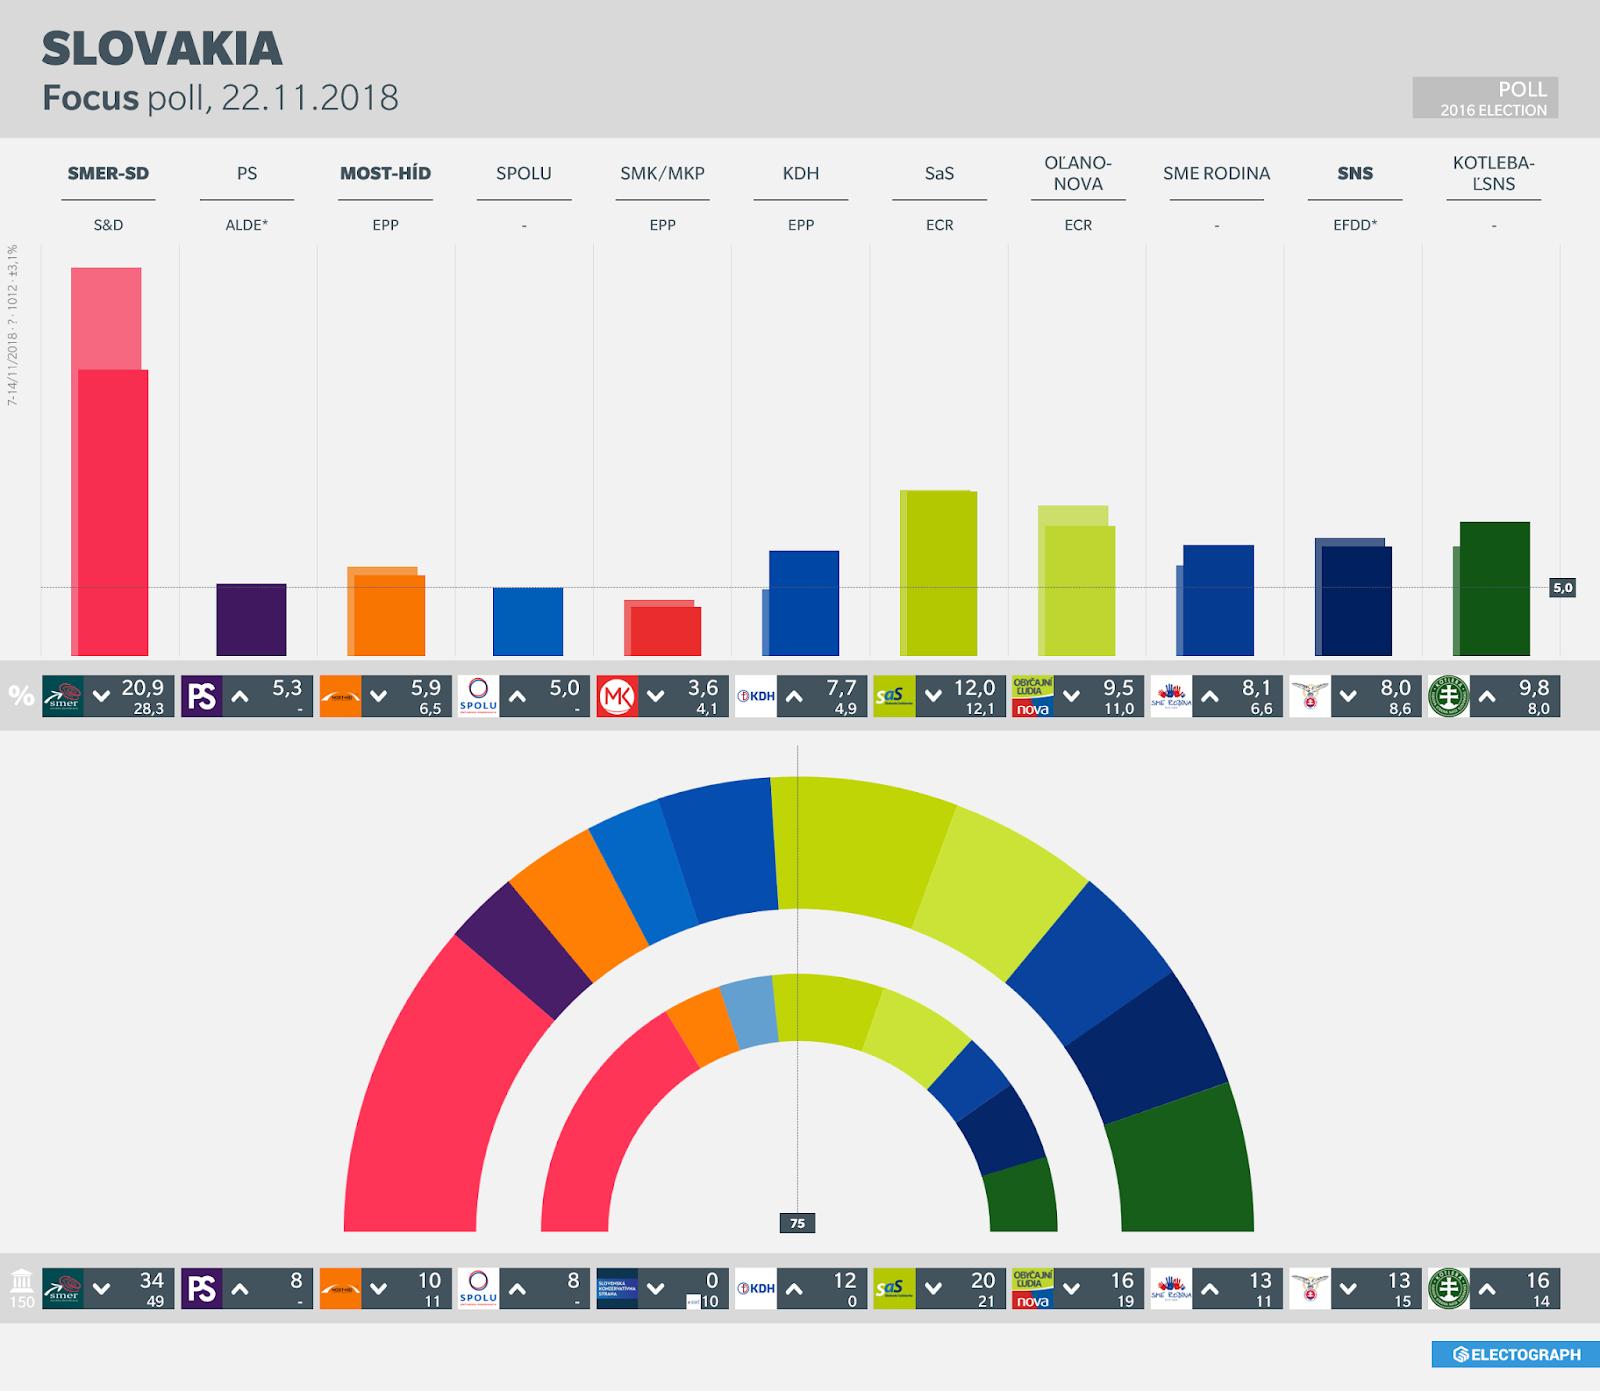 SLOVAKIA: Focus poll chart, 22 November 2018